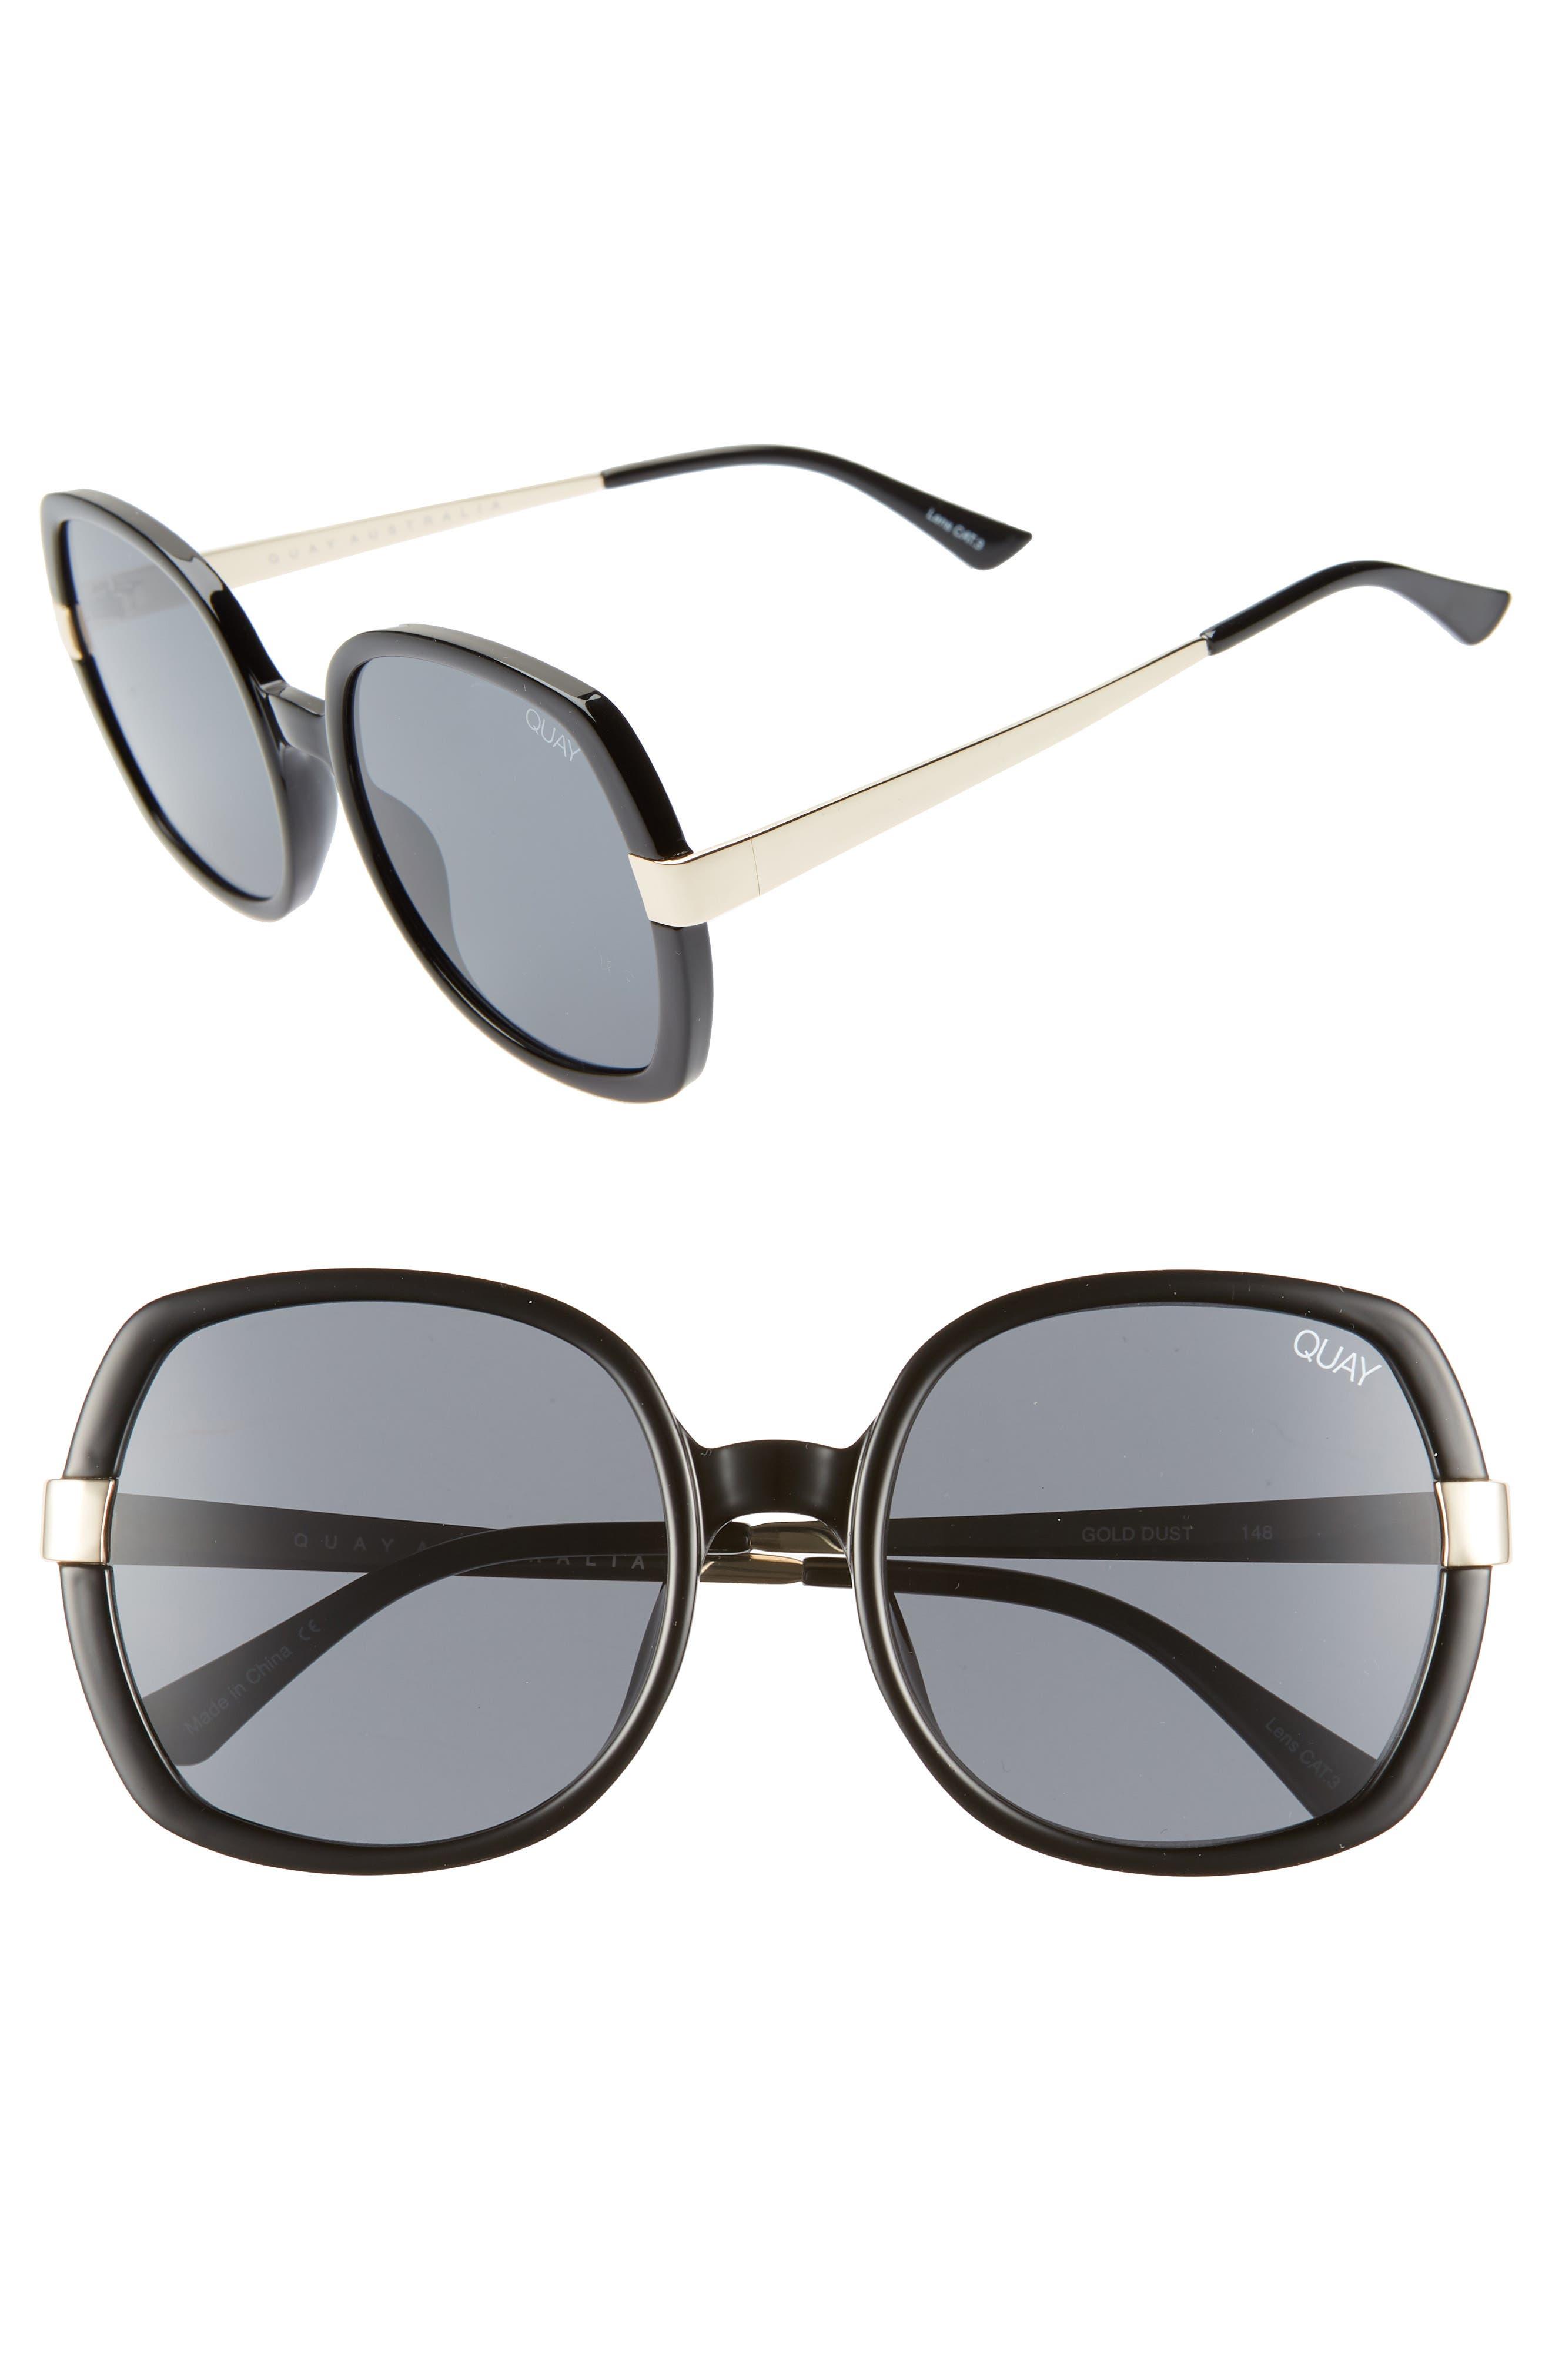 Gold Dust 55mm Square Sunglasses,                         Main,                         color, BLACK / SMOKE